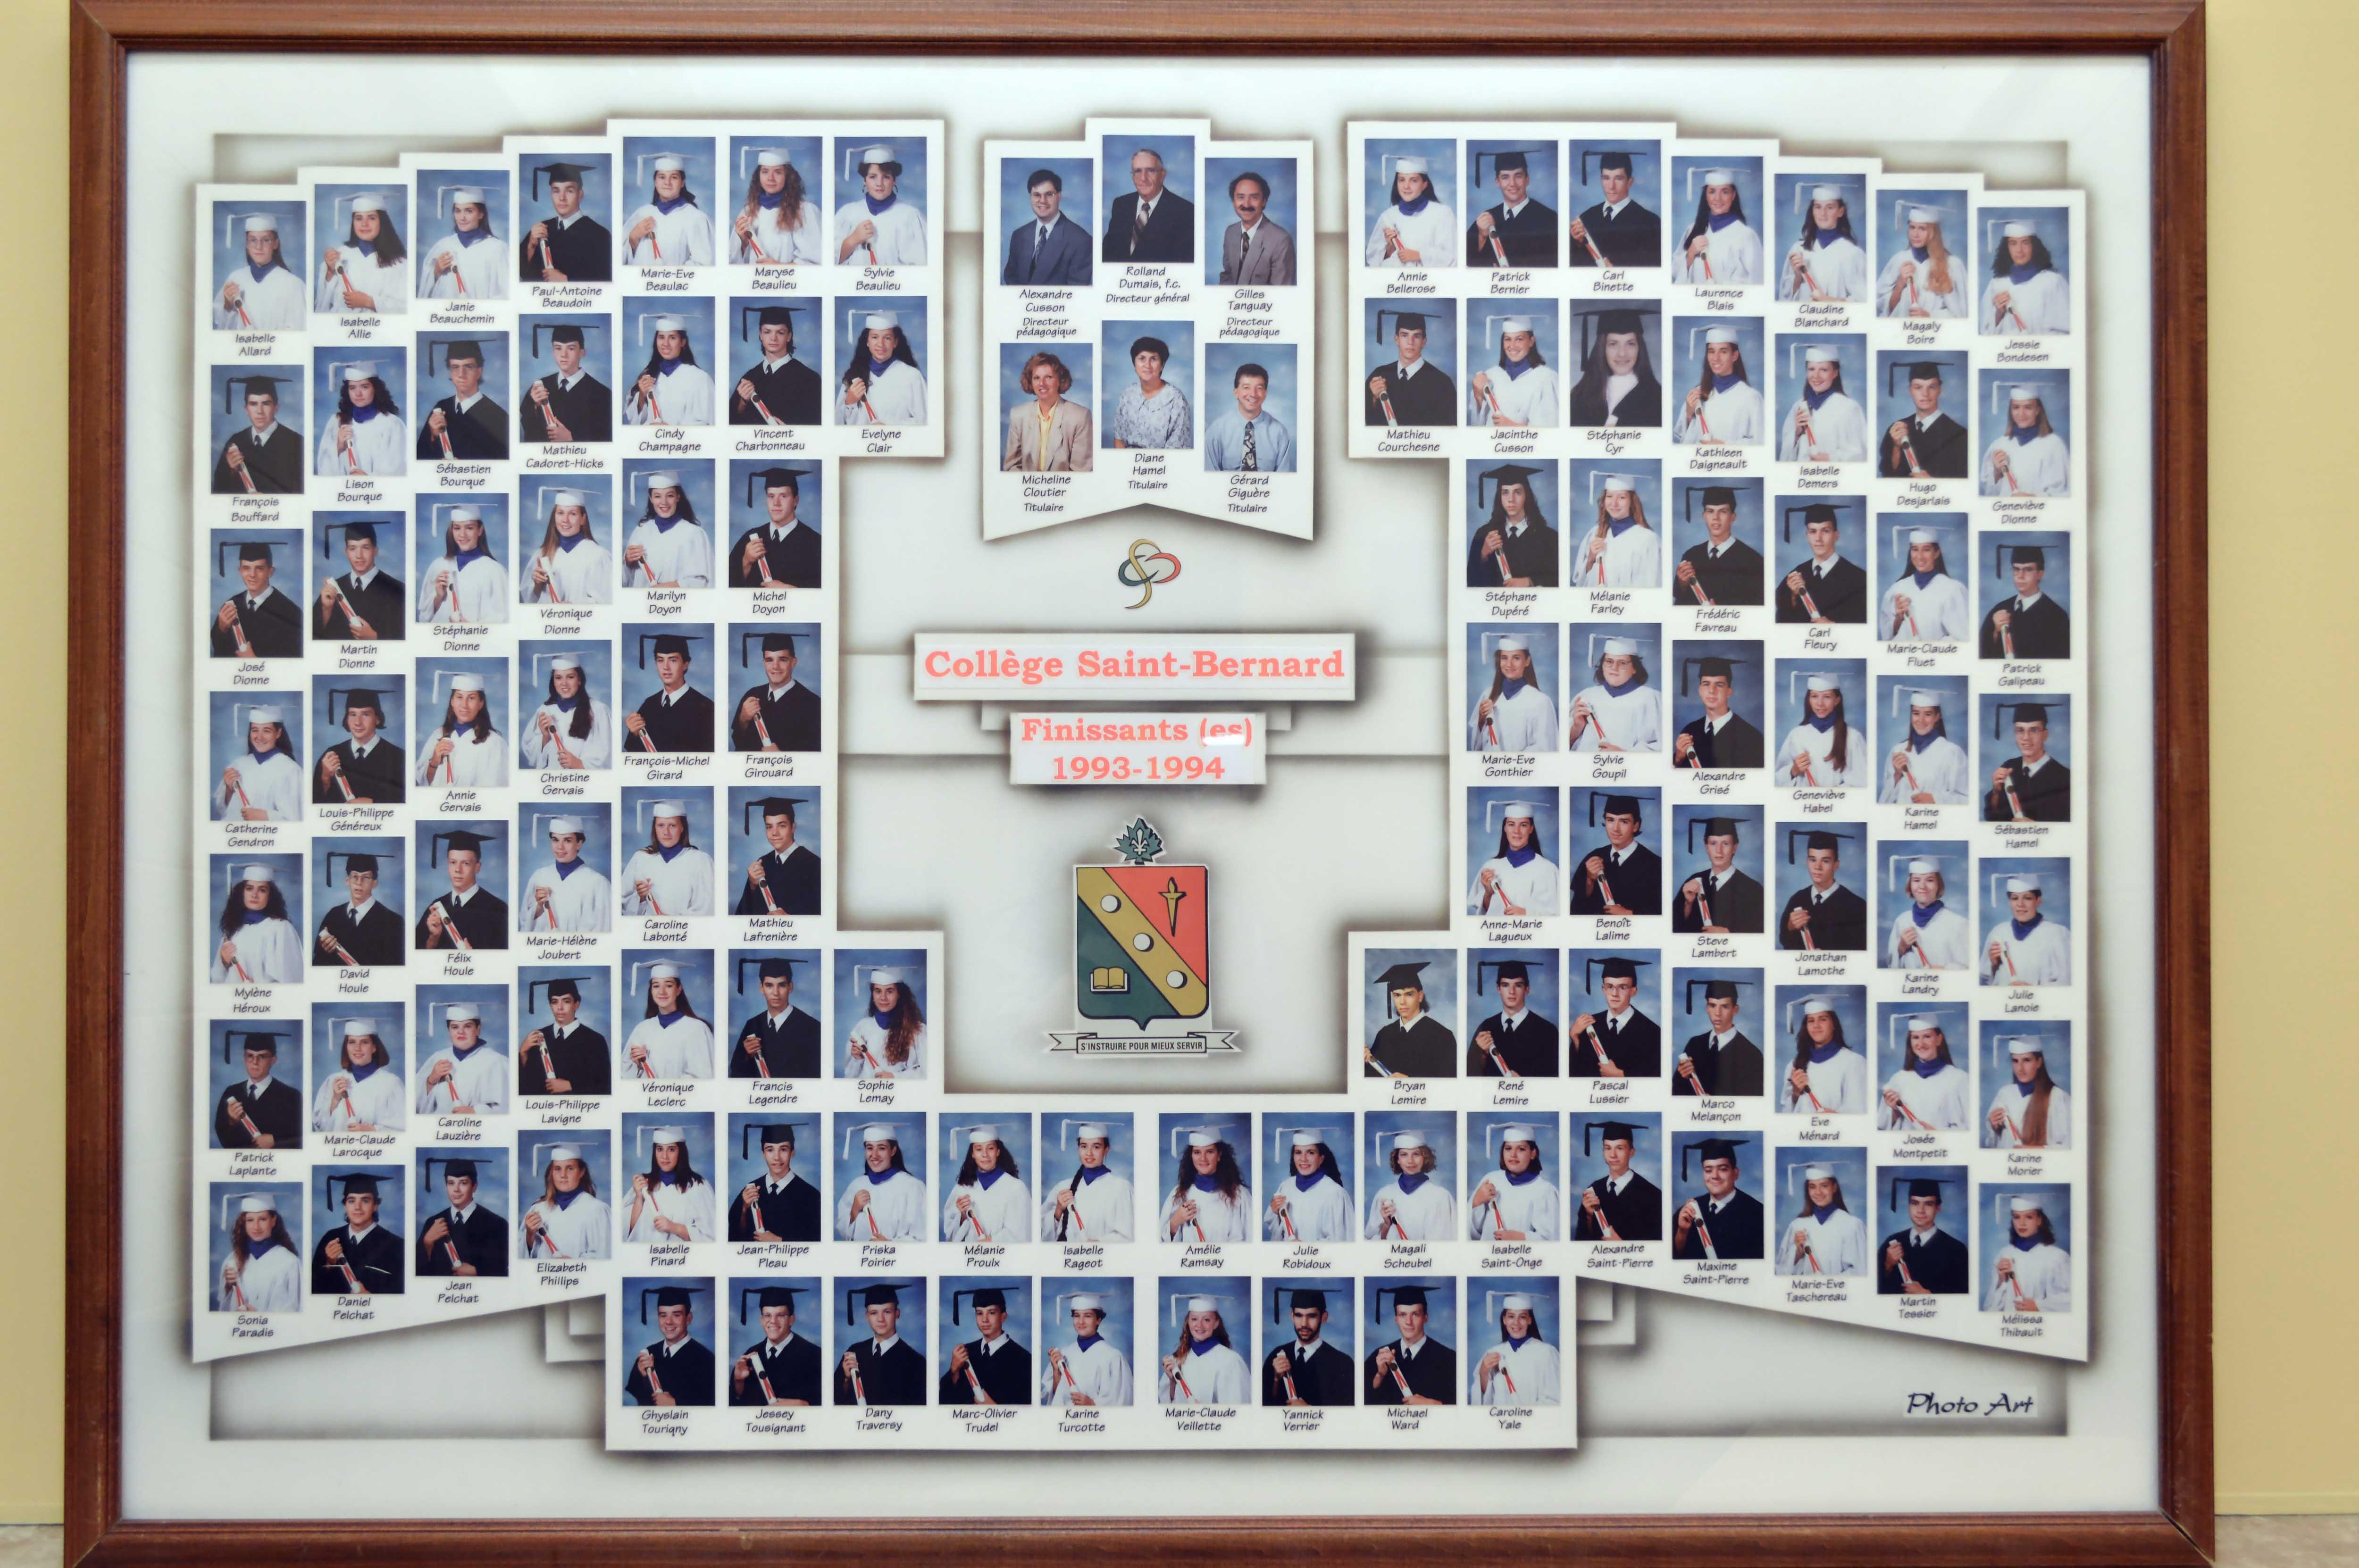 College-Saint-Bernard_Graduations-1993-94